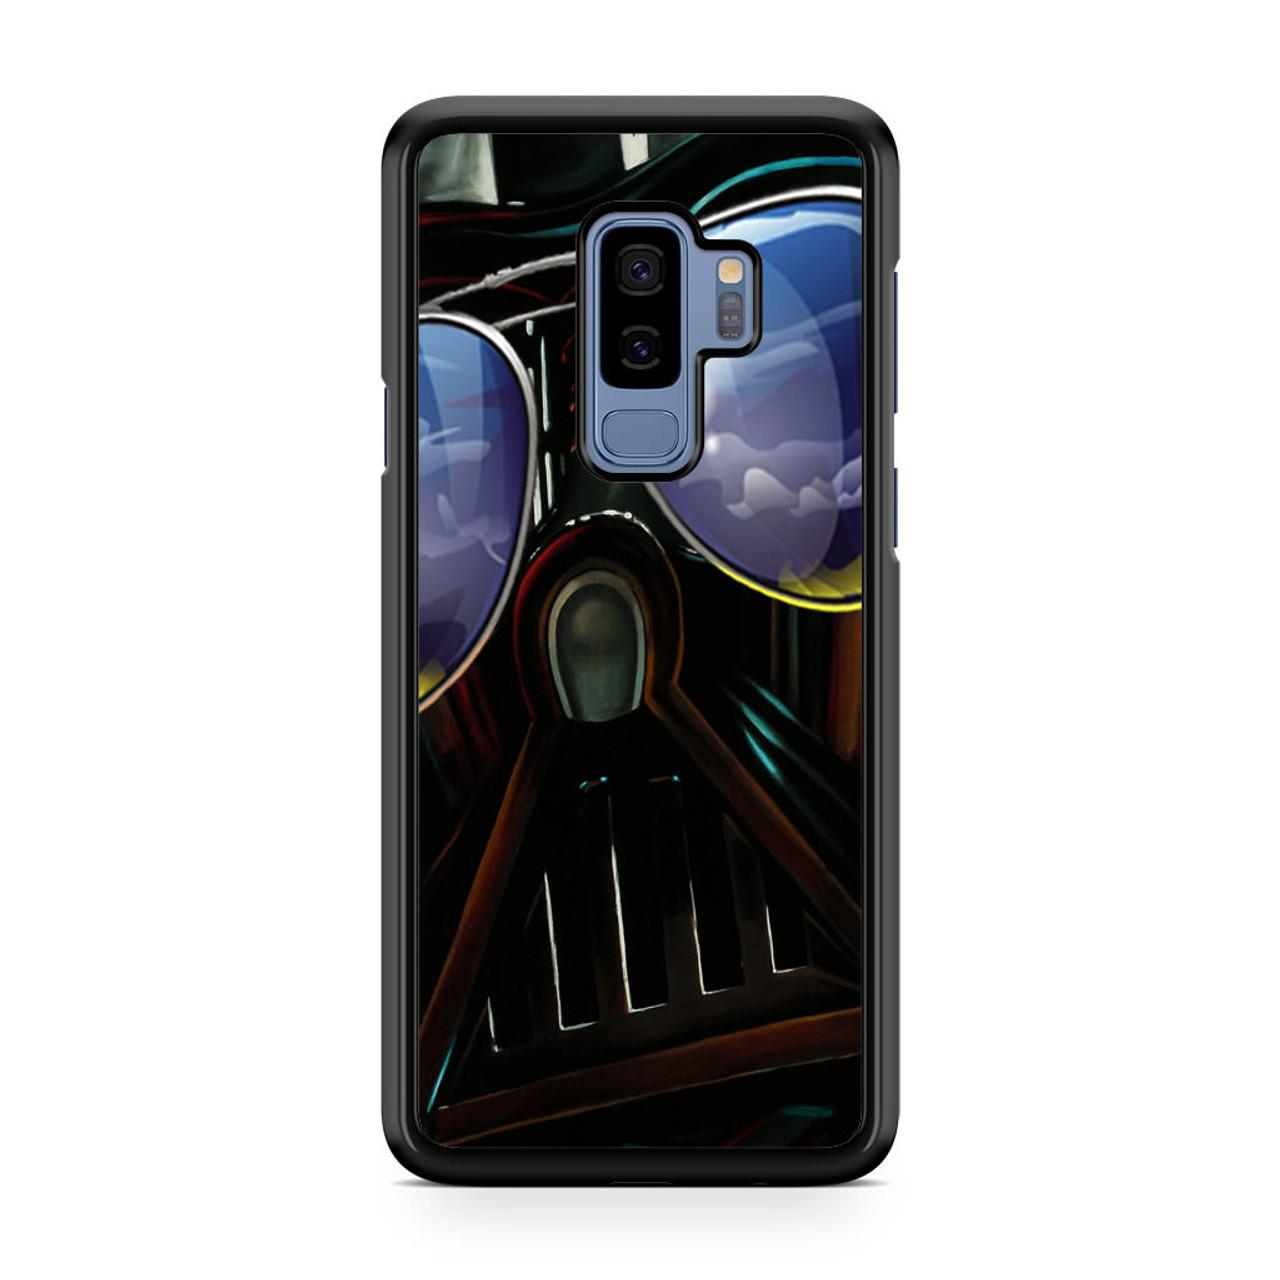 premium selection 7989d 90434 Star Wars Darth Vader Sunglasses Samsung Galaxy S9 Plus Case